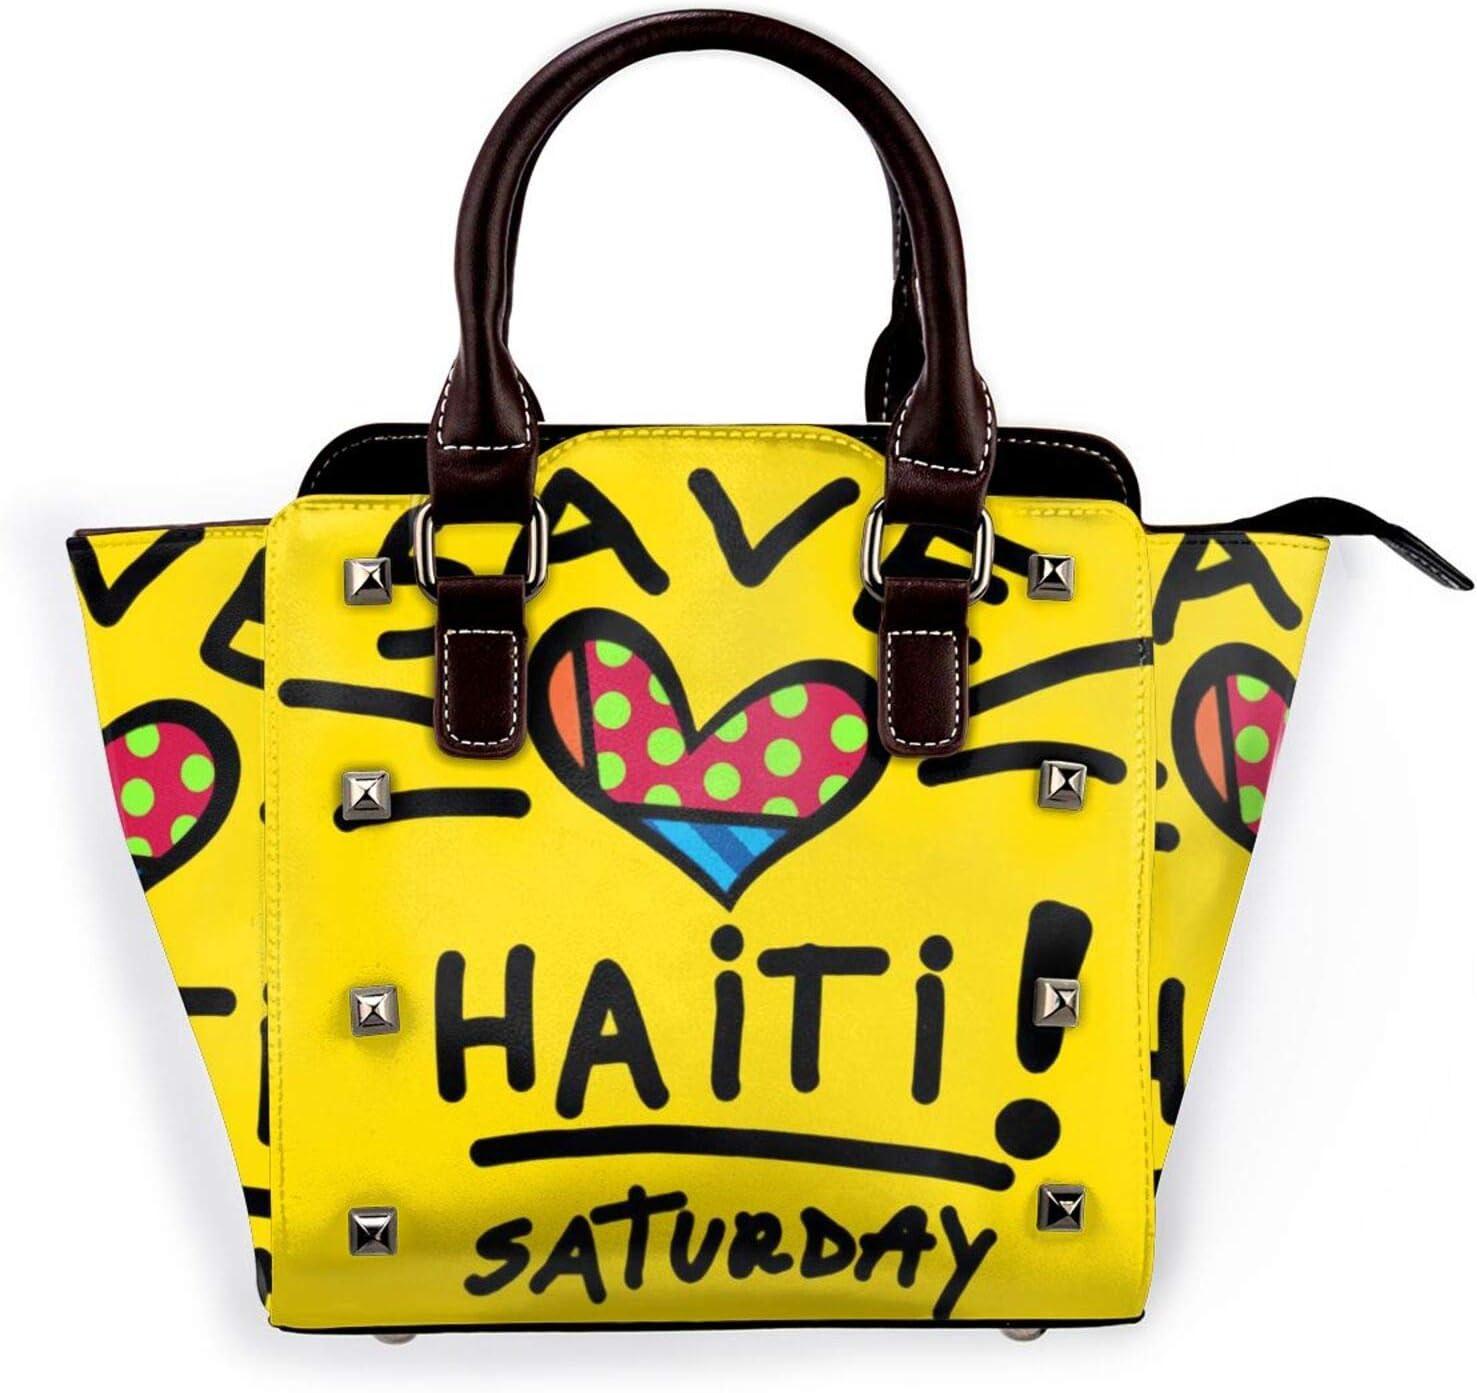 Tote Sale special price Bag Galaxy Voyage Save Durabl Waterproof Shoulder Tulsa Mall Haiti